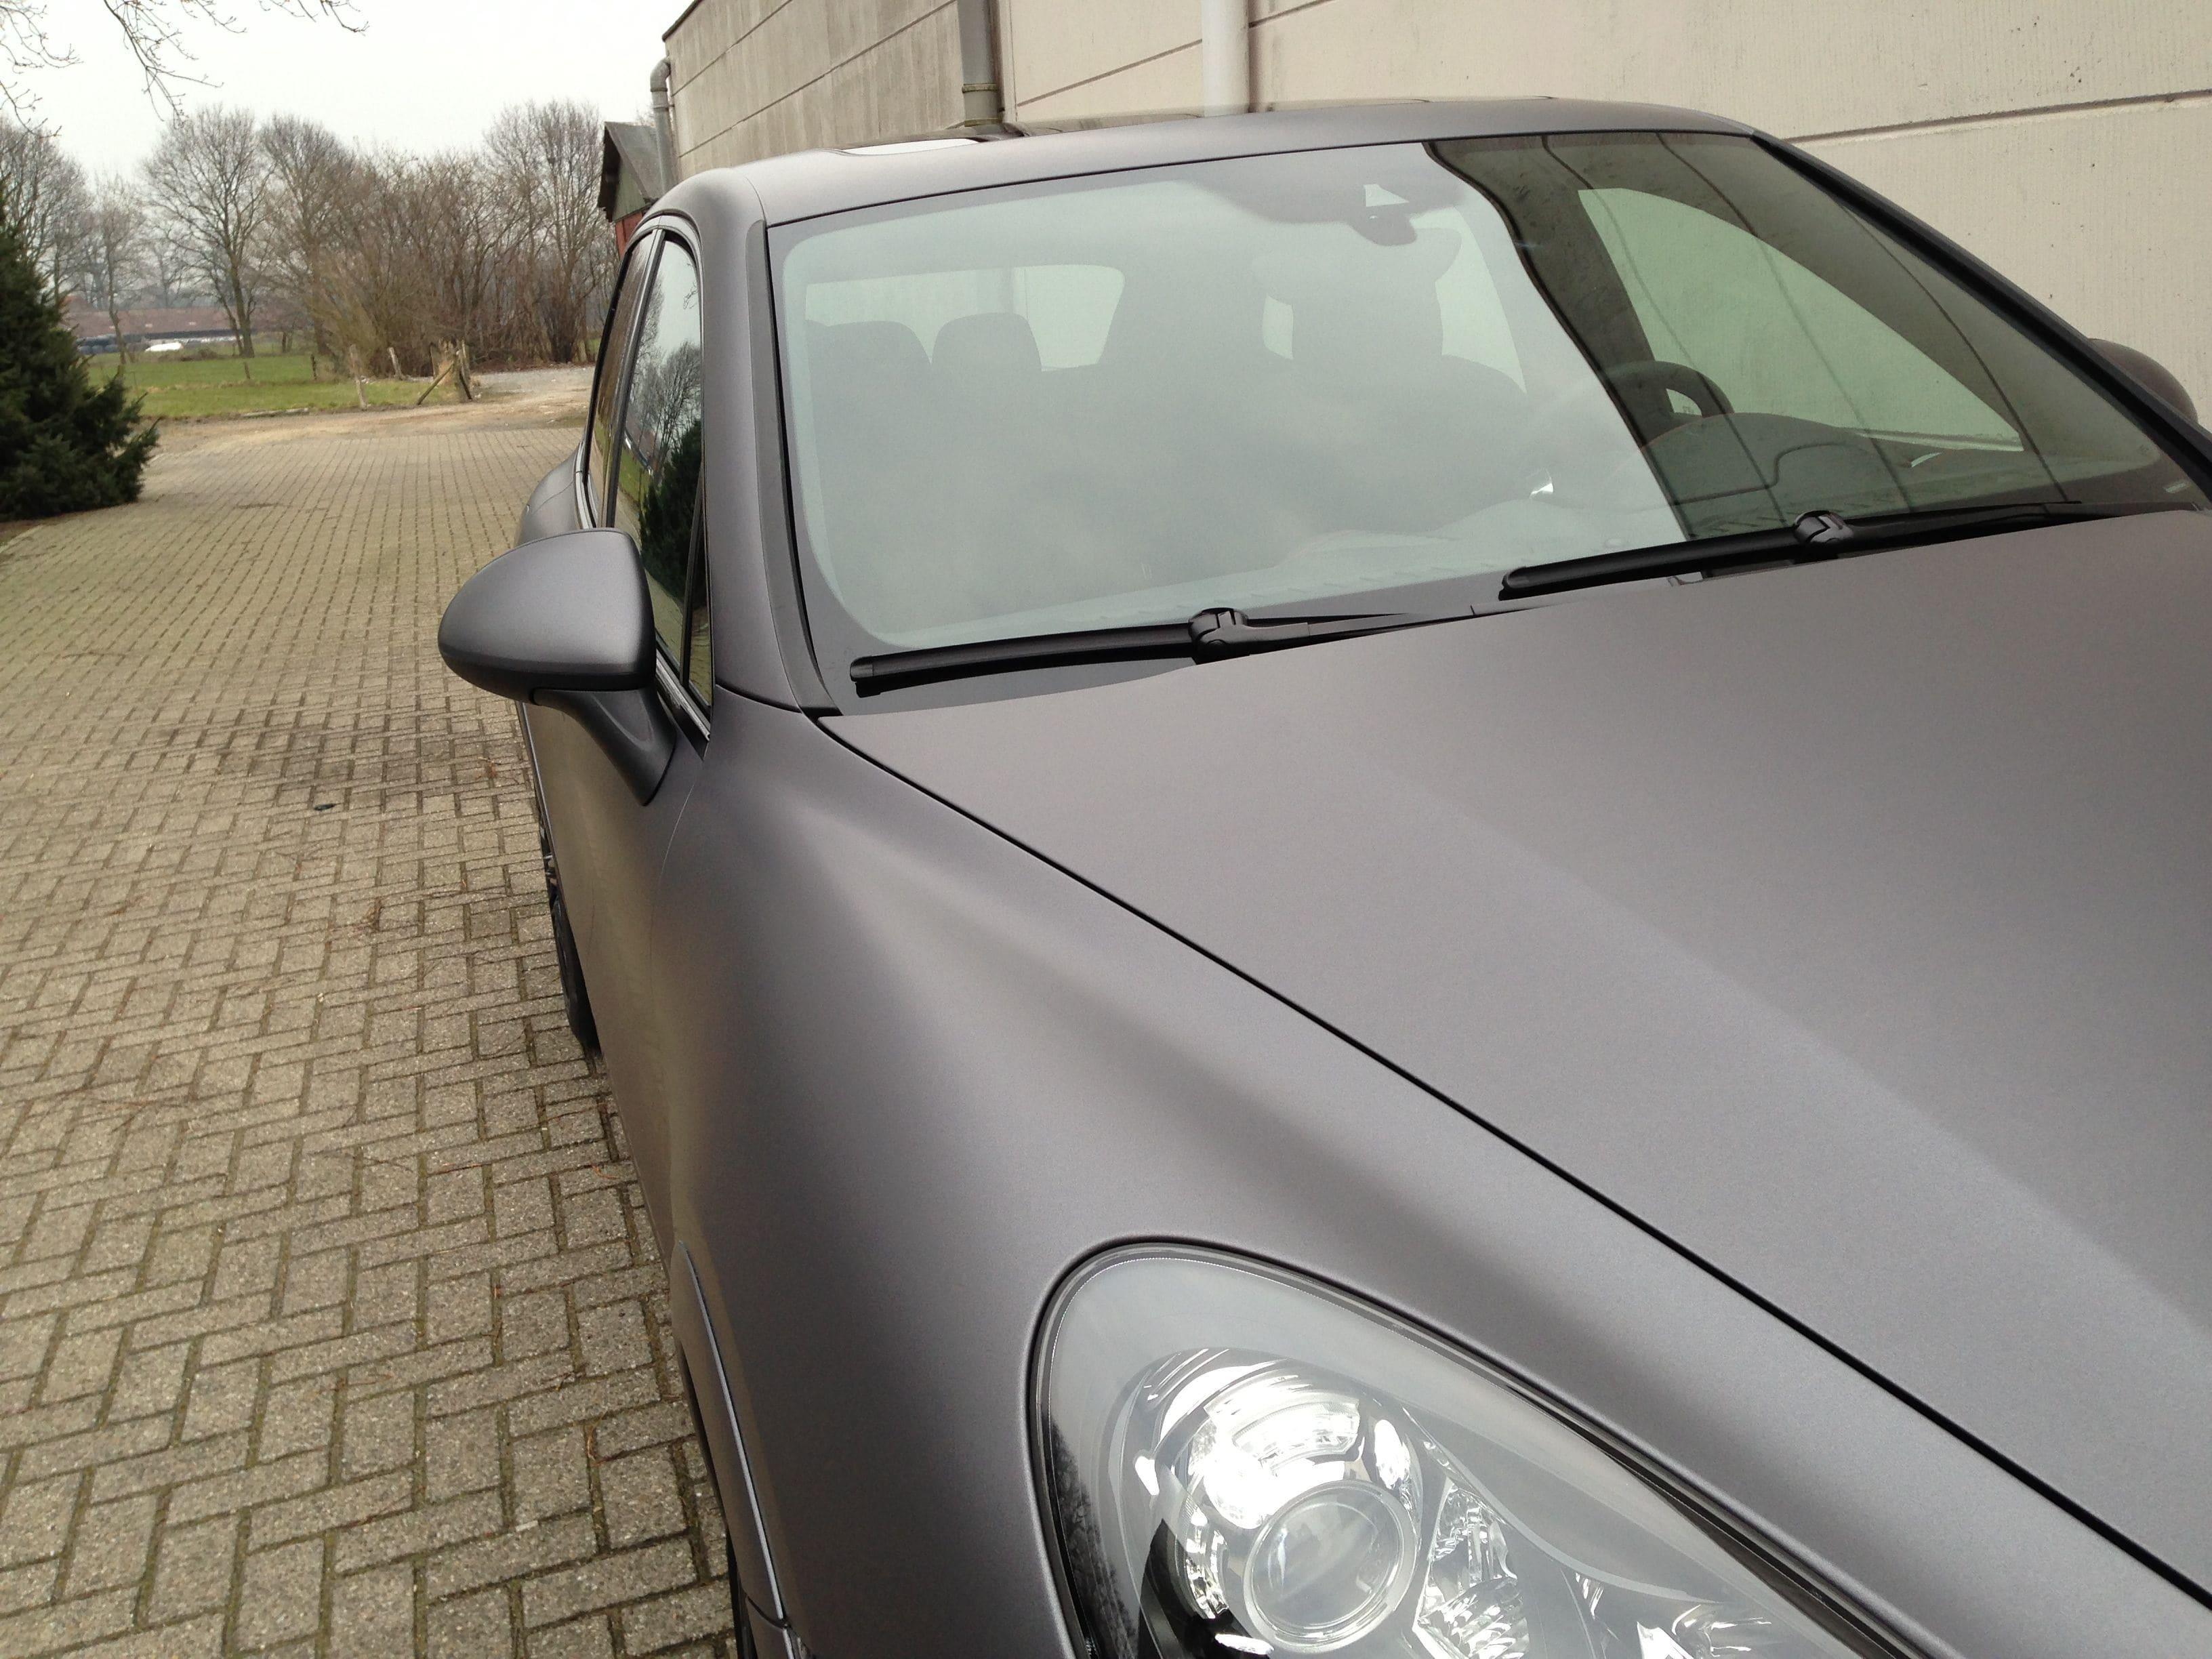 Porsche Cayenne GTS met Gunpowder Wrap, Carwrapping door Wrapmyride.nu Foto-nr:6769, ©2020